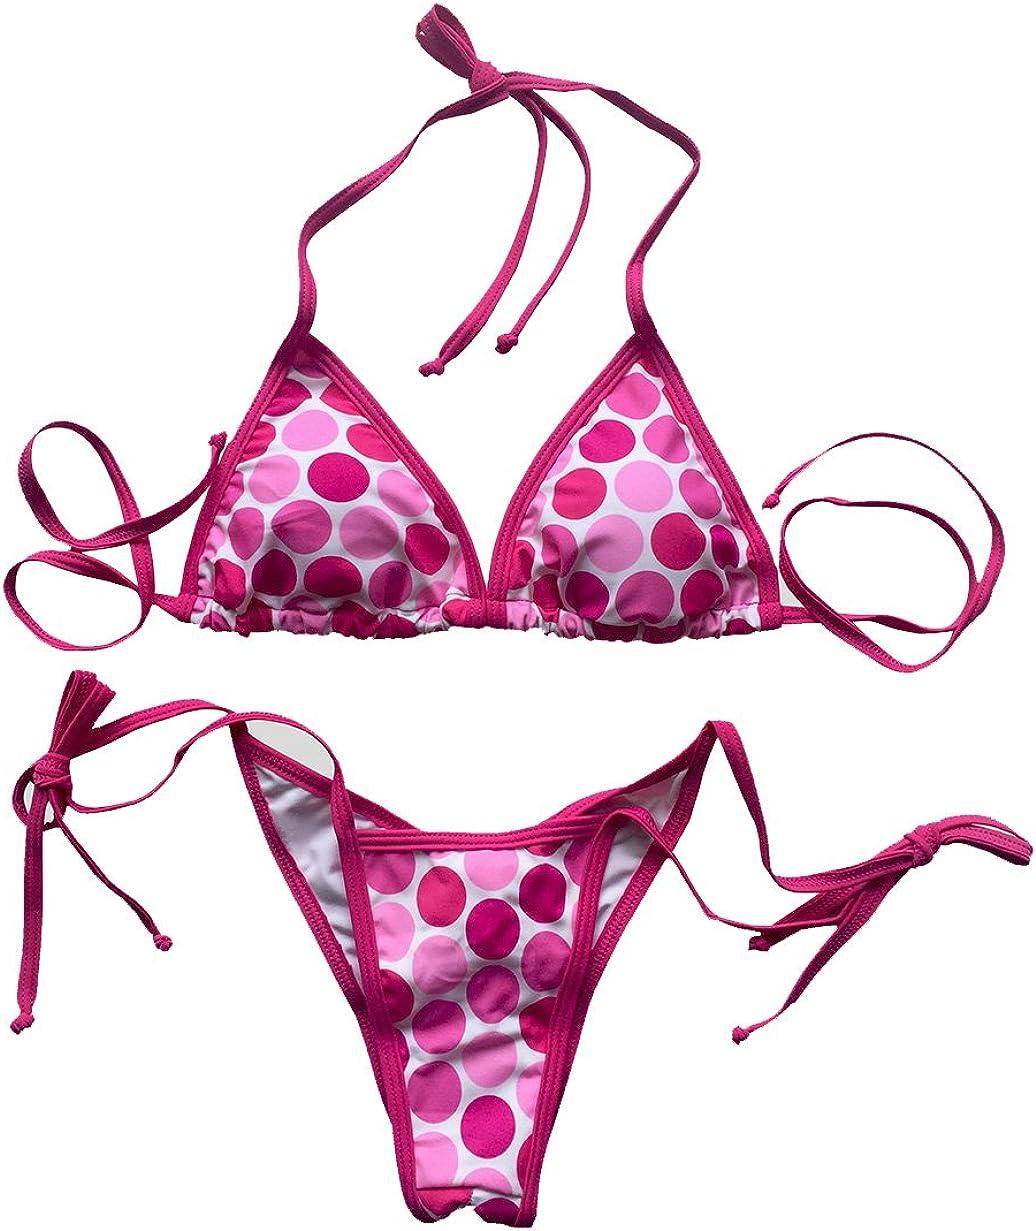 LE BESI Womens Mini Fashion Elegant Inspired Swimsuit Bikini Top Bottom